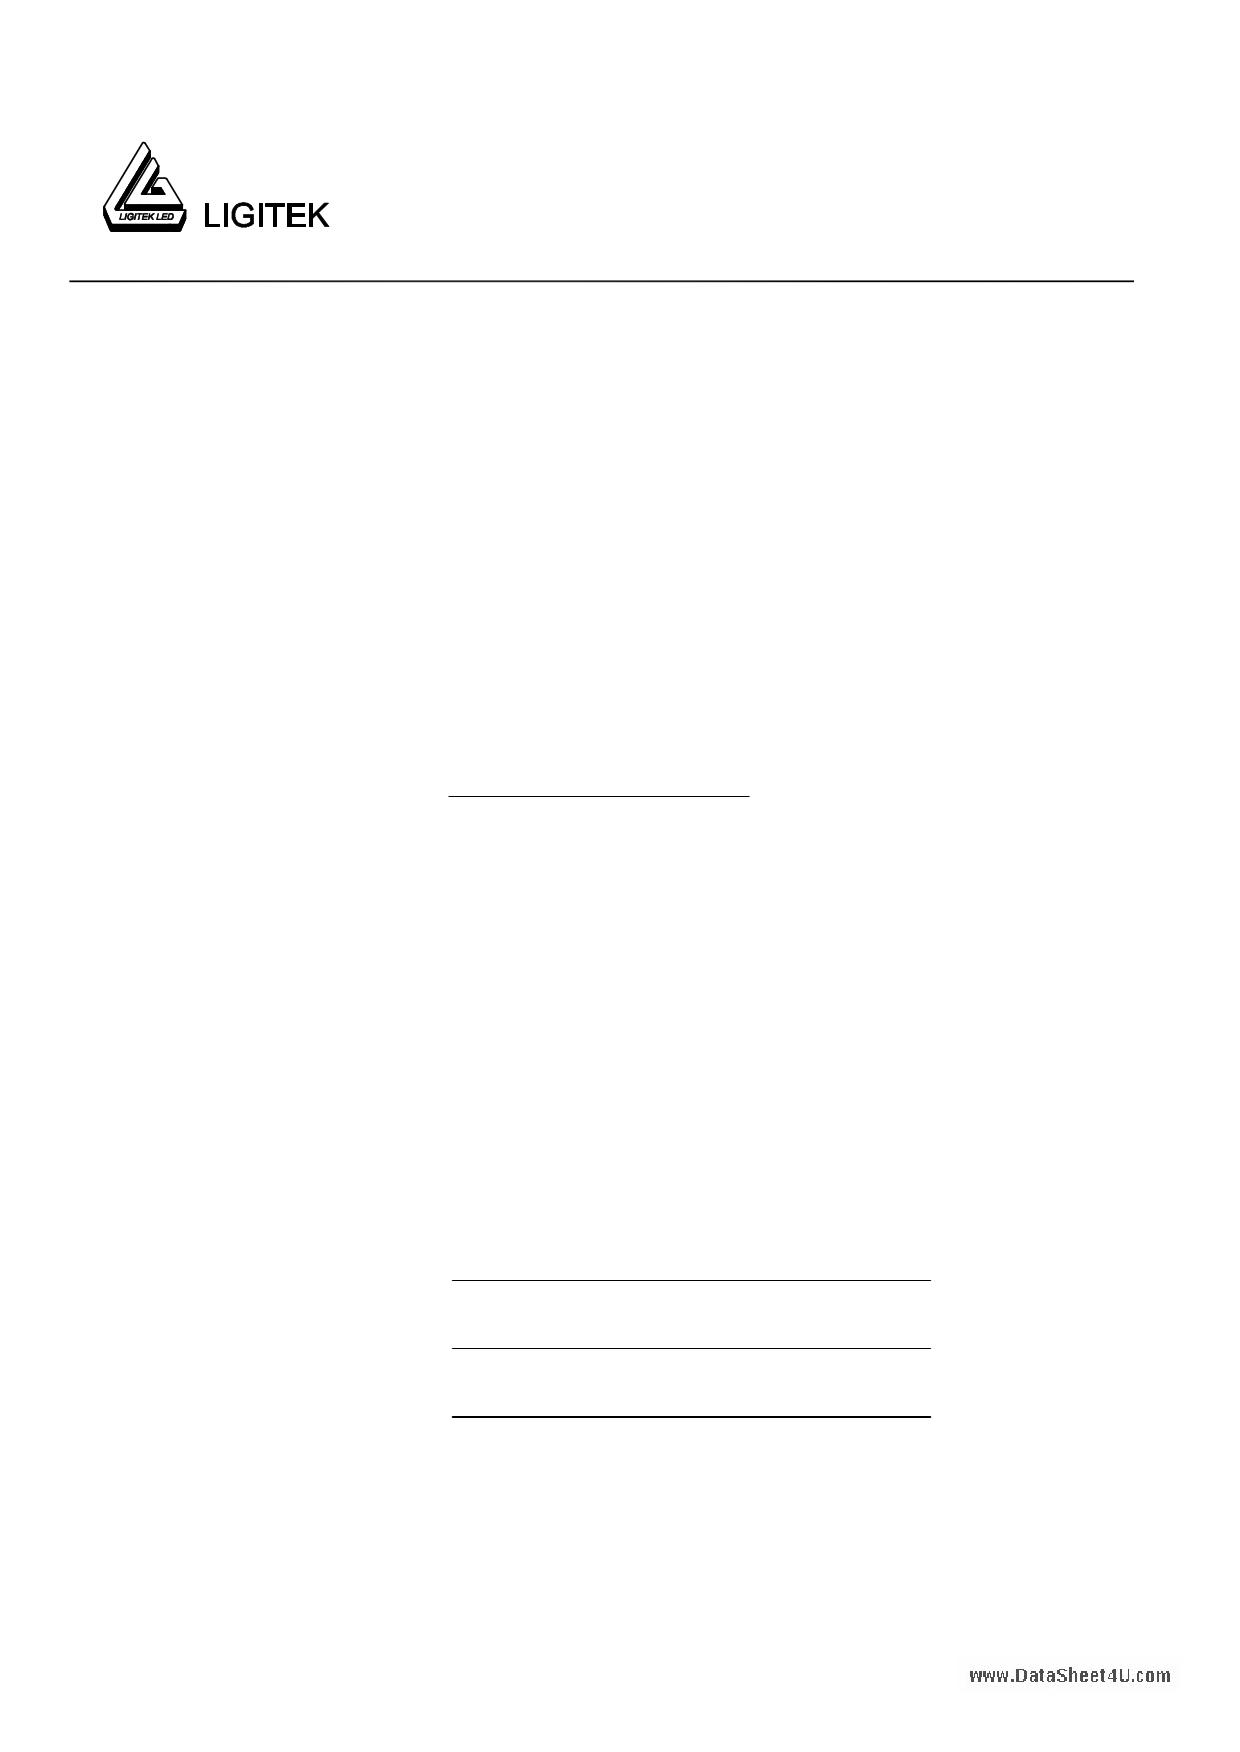 L-00501VY-S datasheet